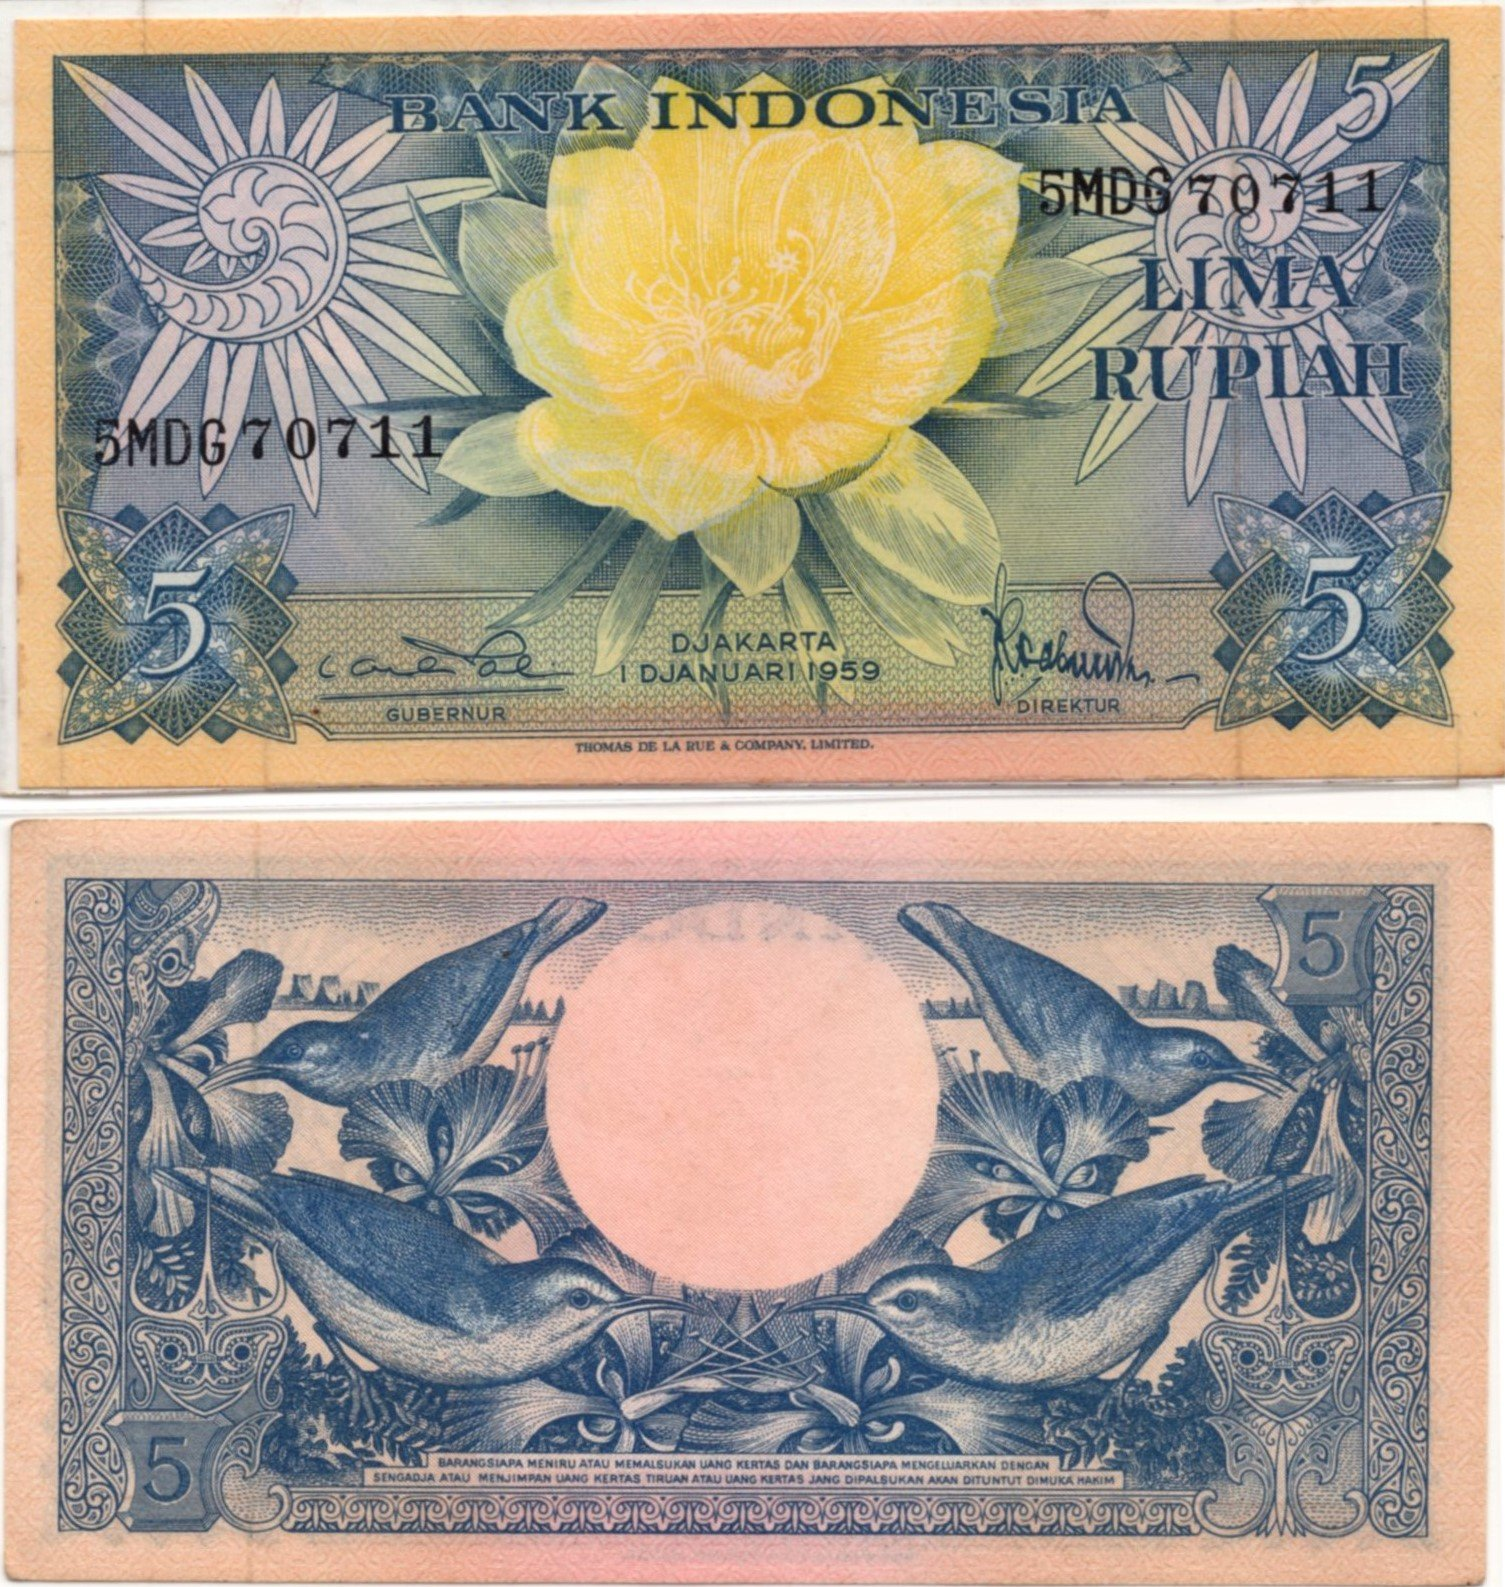 Indonesia 5 rupiah 1959